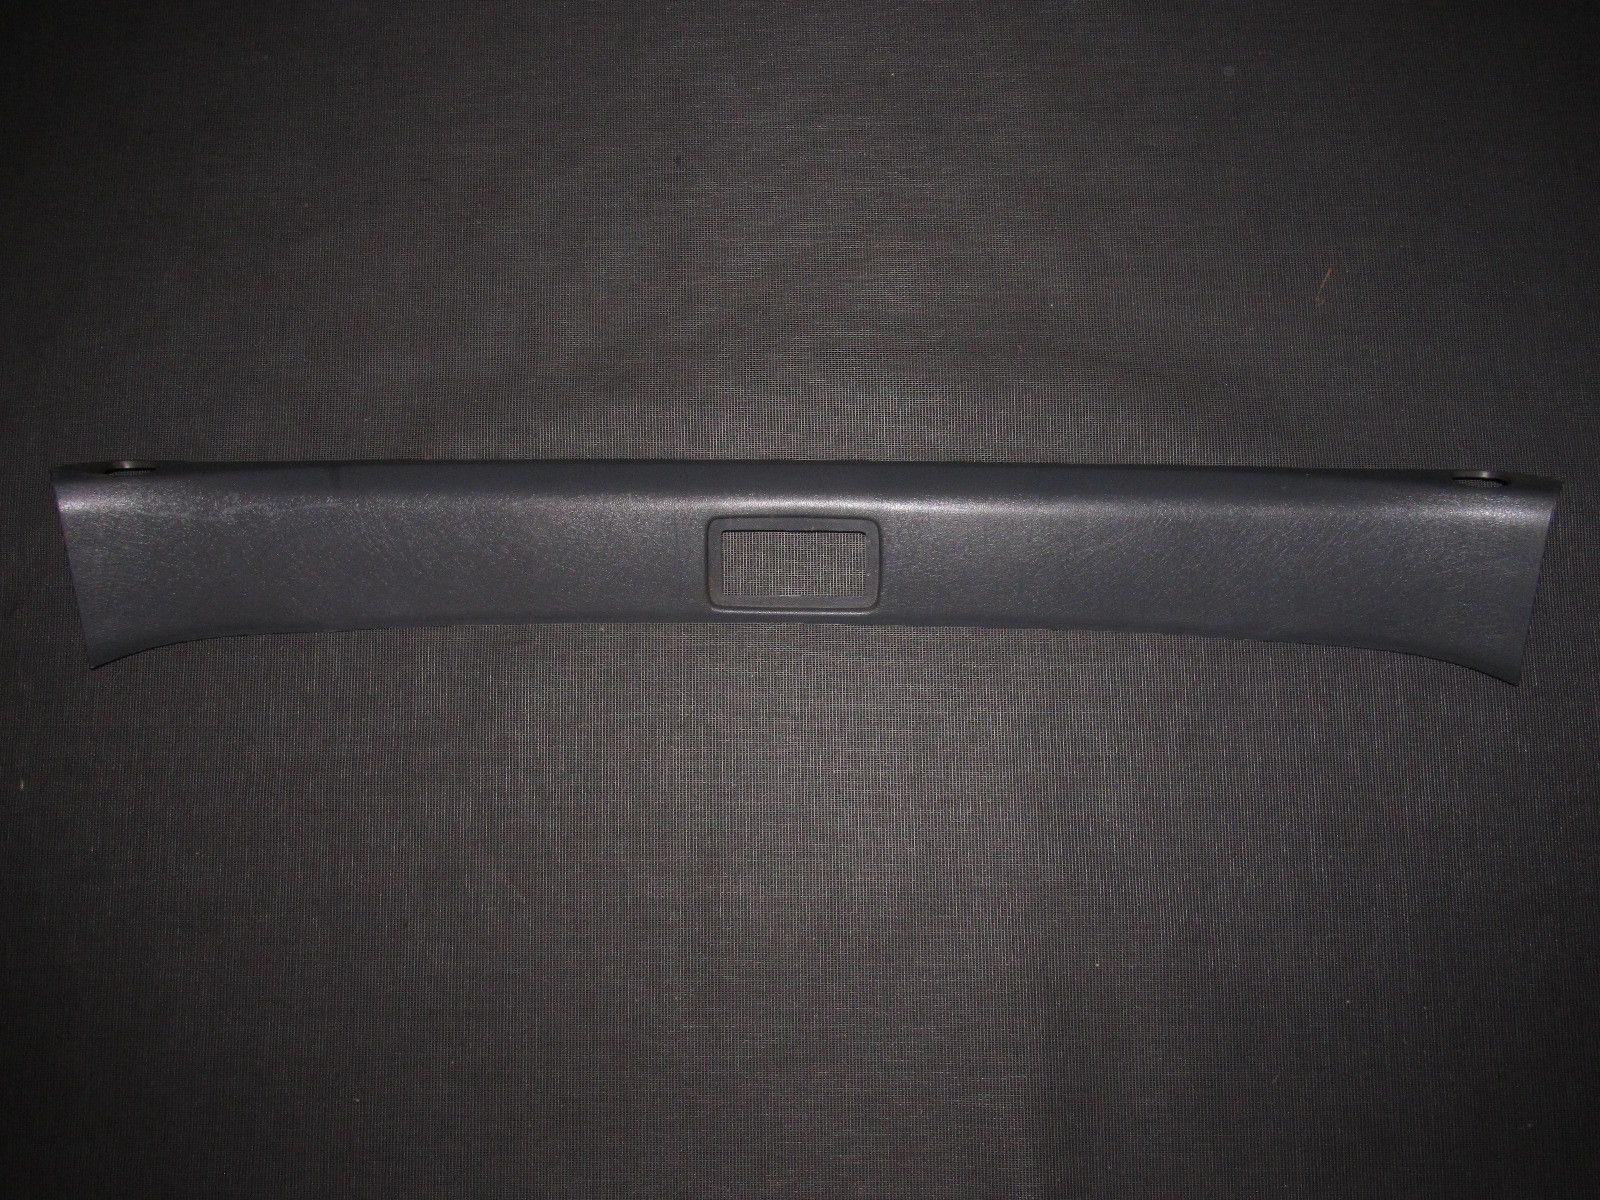 93 94 95 96 97 Honda Del Sol OEM Interior Rear Headliner Cover Panel